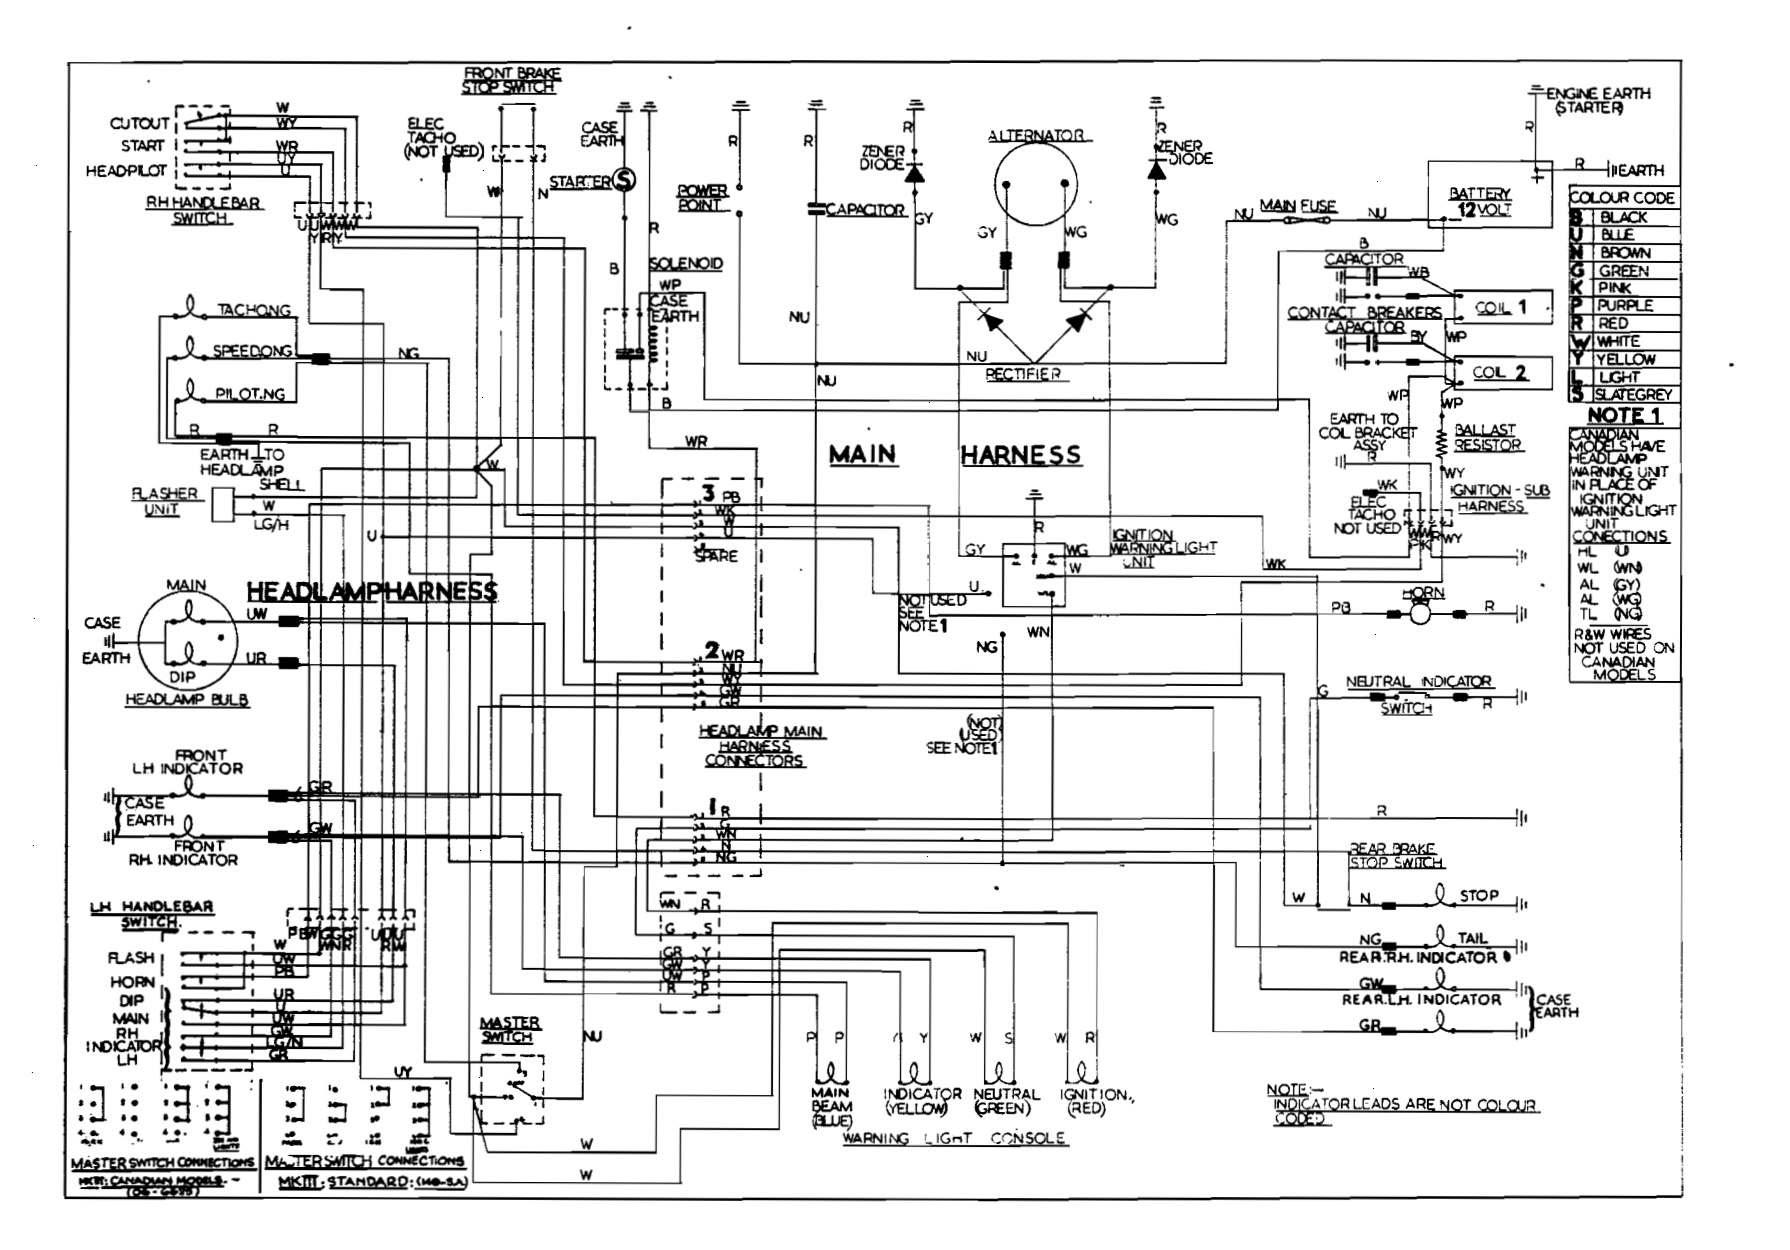 Kuchen Backofen  Atlas Copco Elektronikon Wiring Diagram